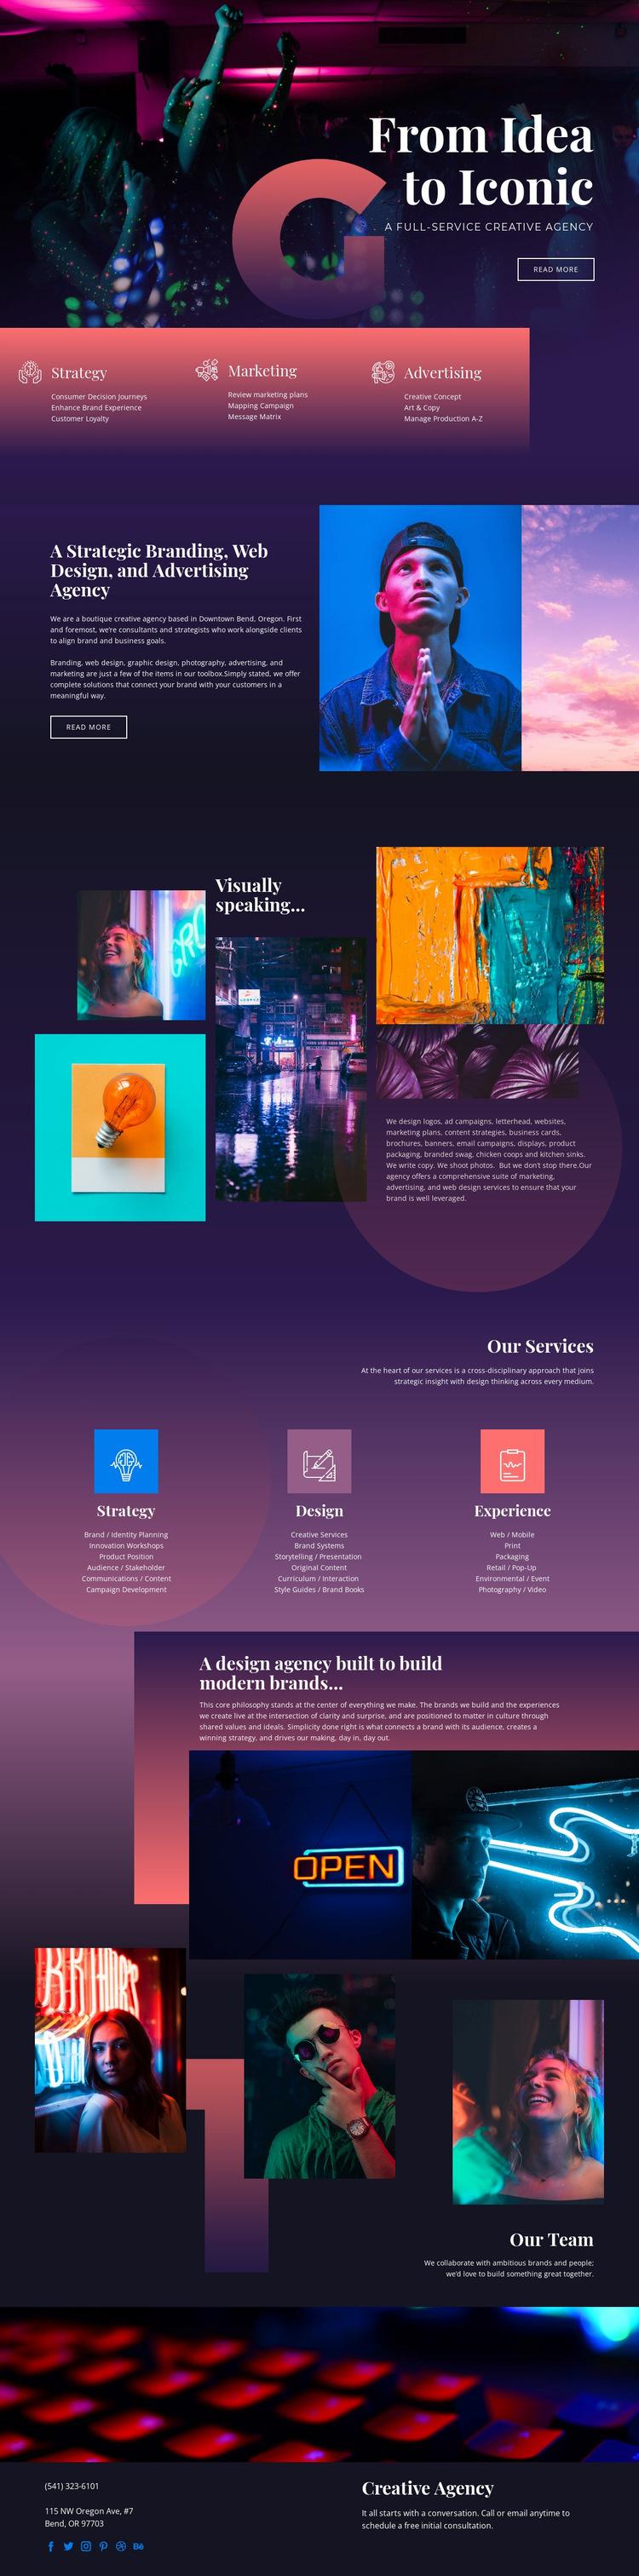 Iconic ideas of art Website Builder